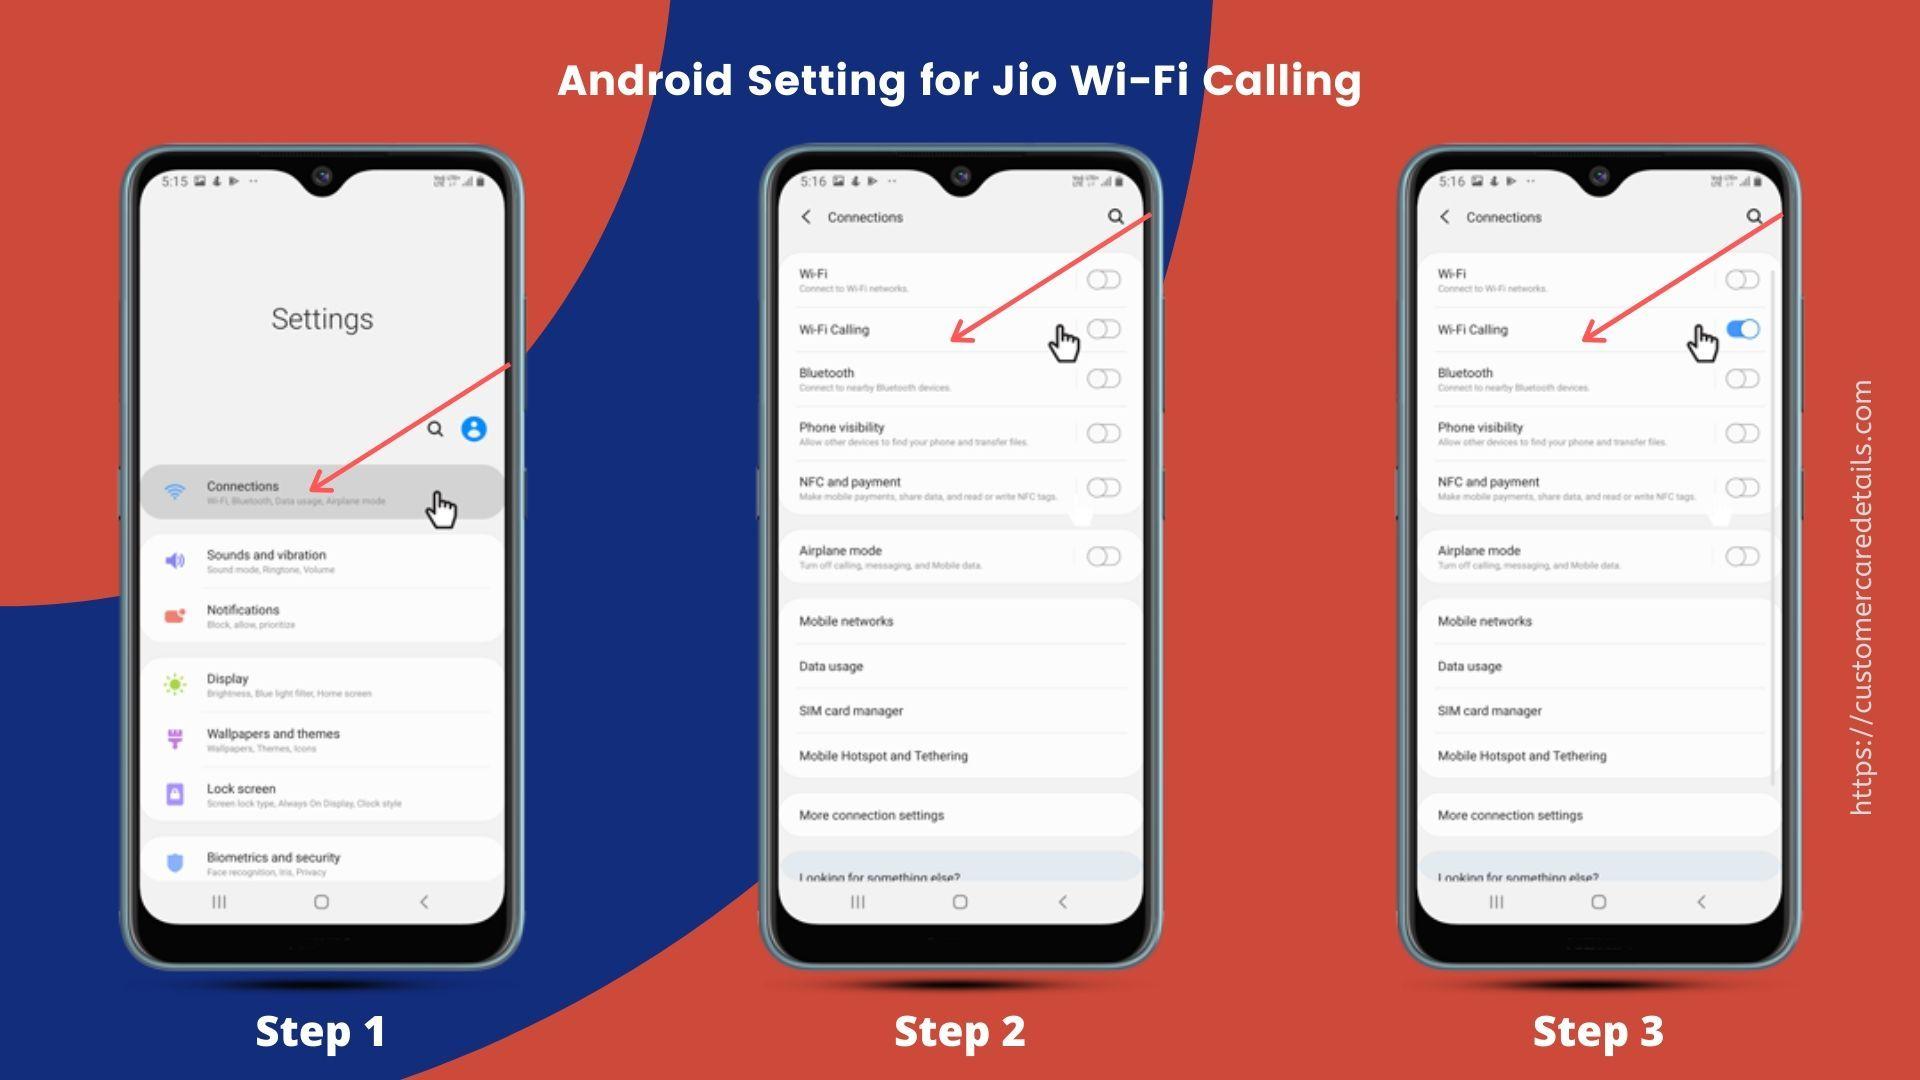 jio-wifi-calling-andriod-settings